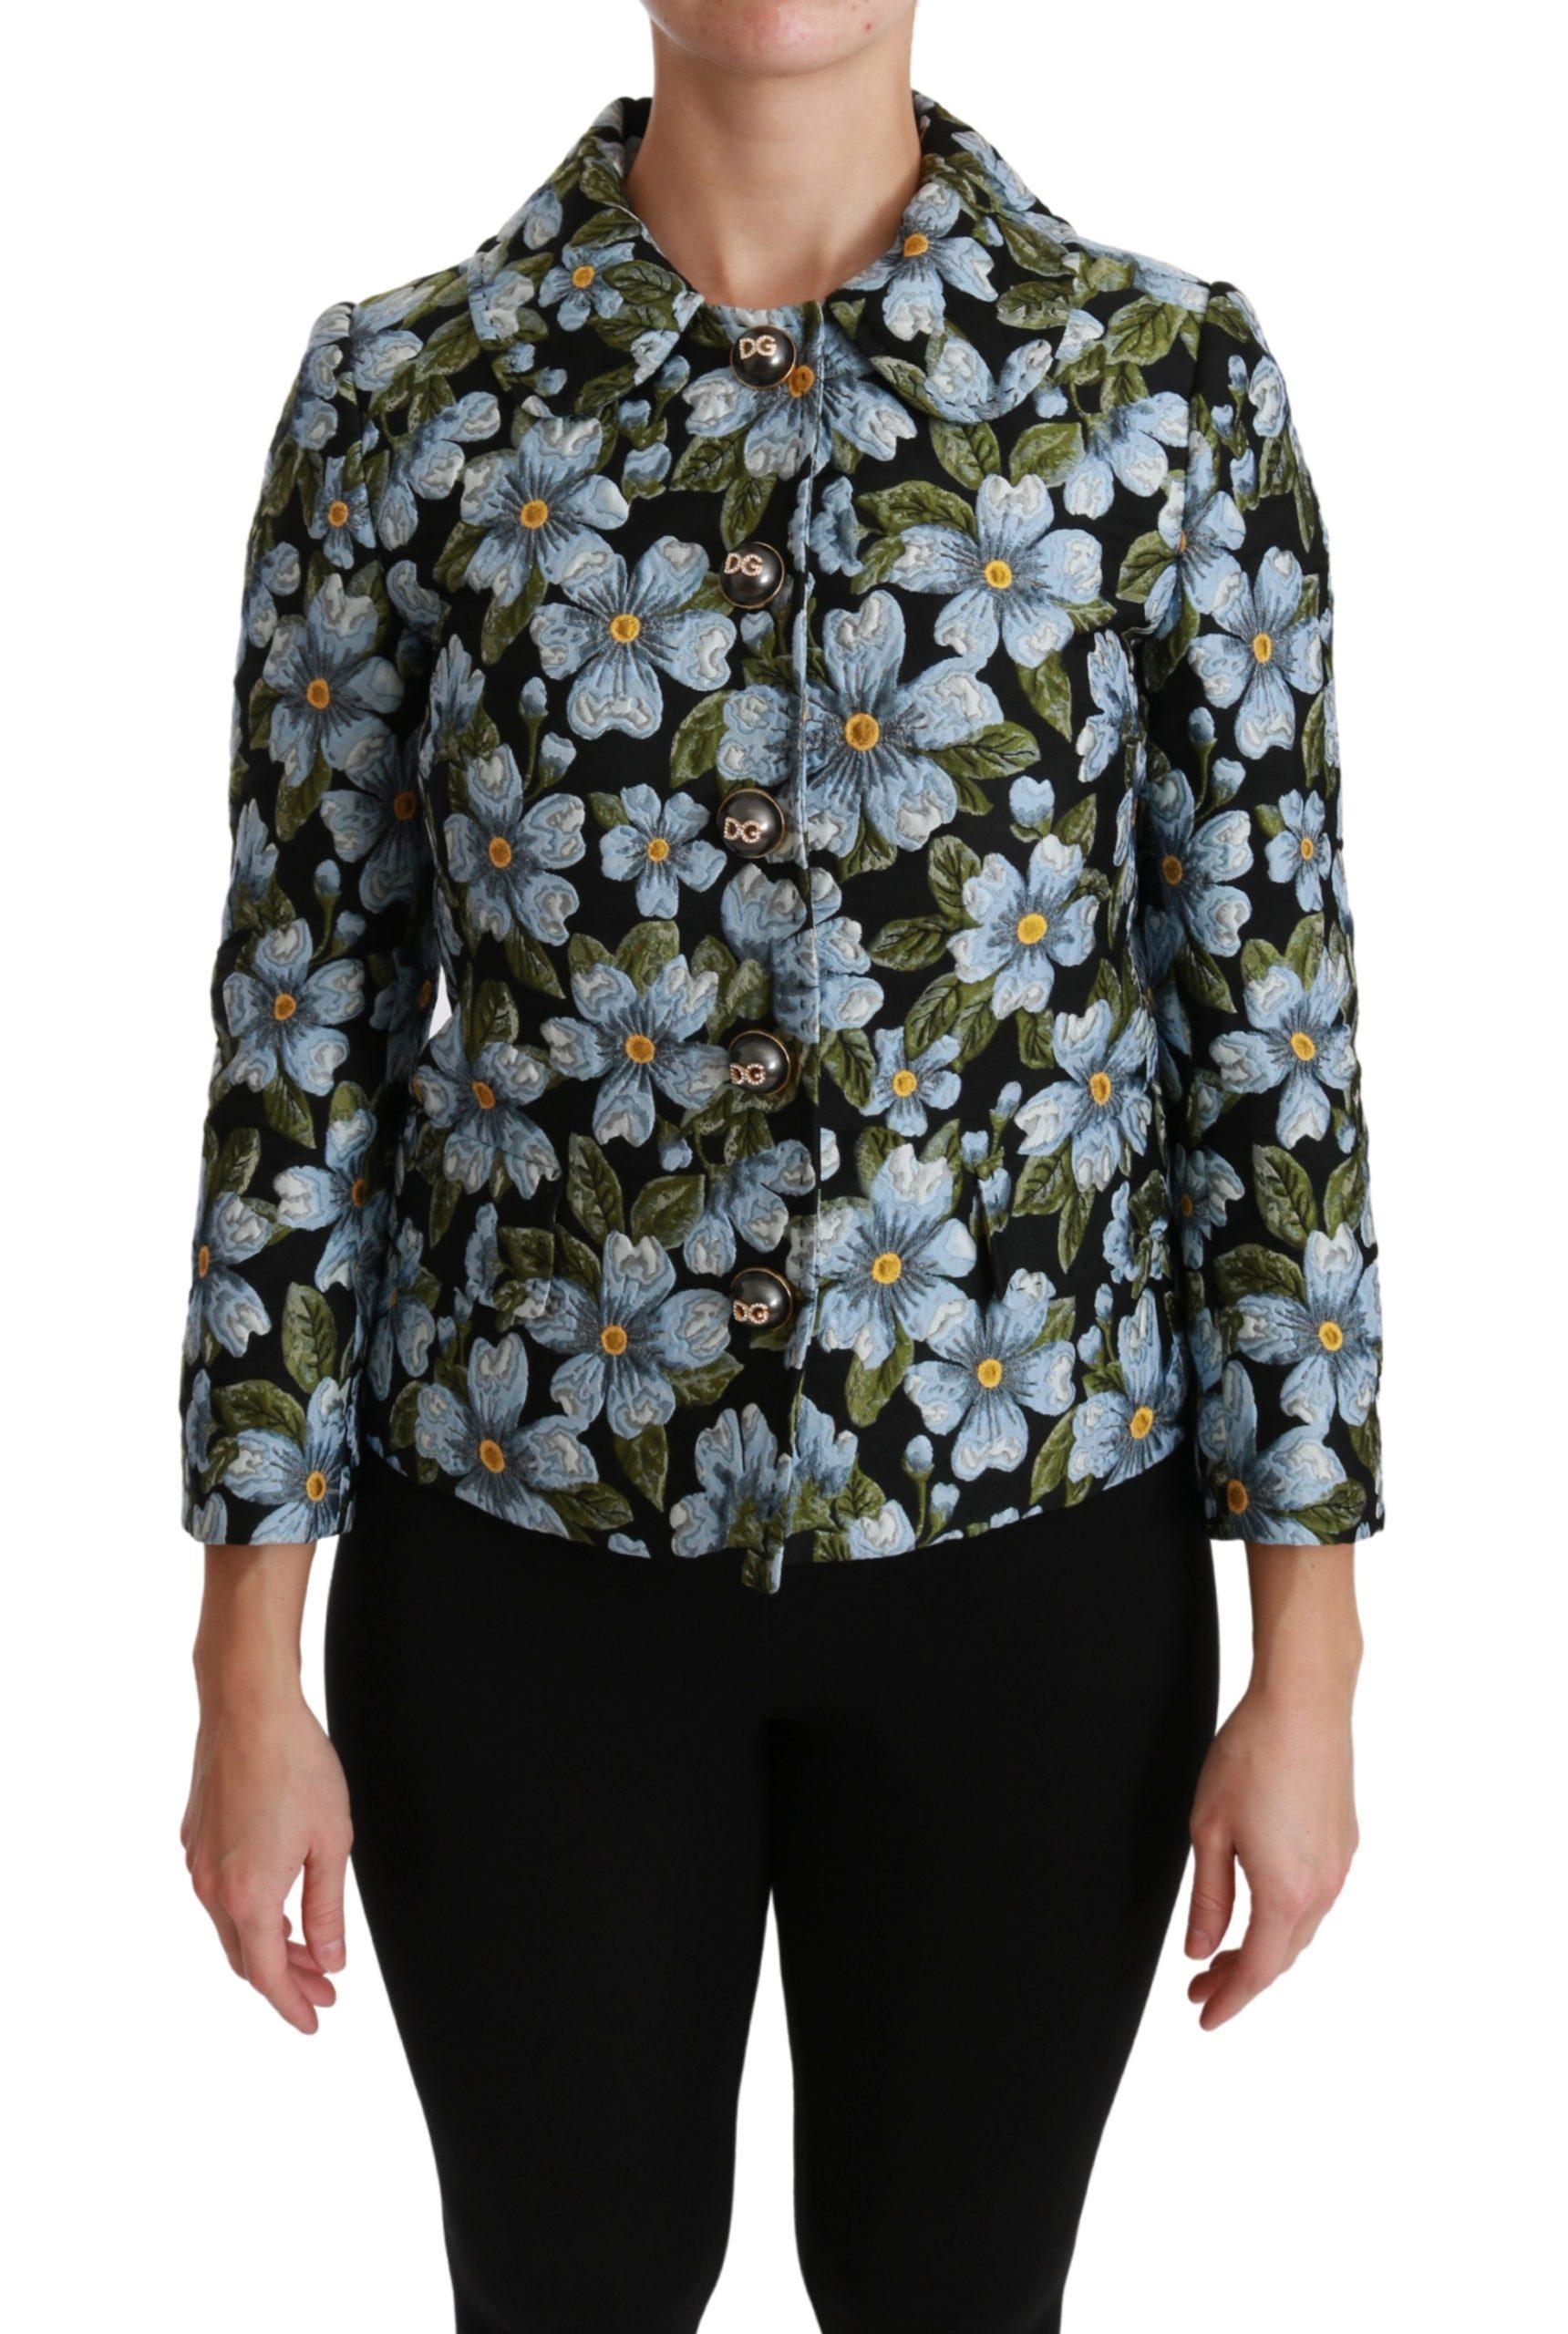 Dolce & Gabbana Women's Floral Coat Polyester Blazer Jacket Black JKT2565 - IT40|S